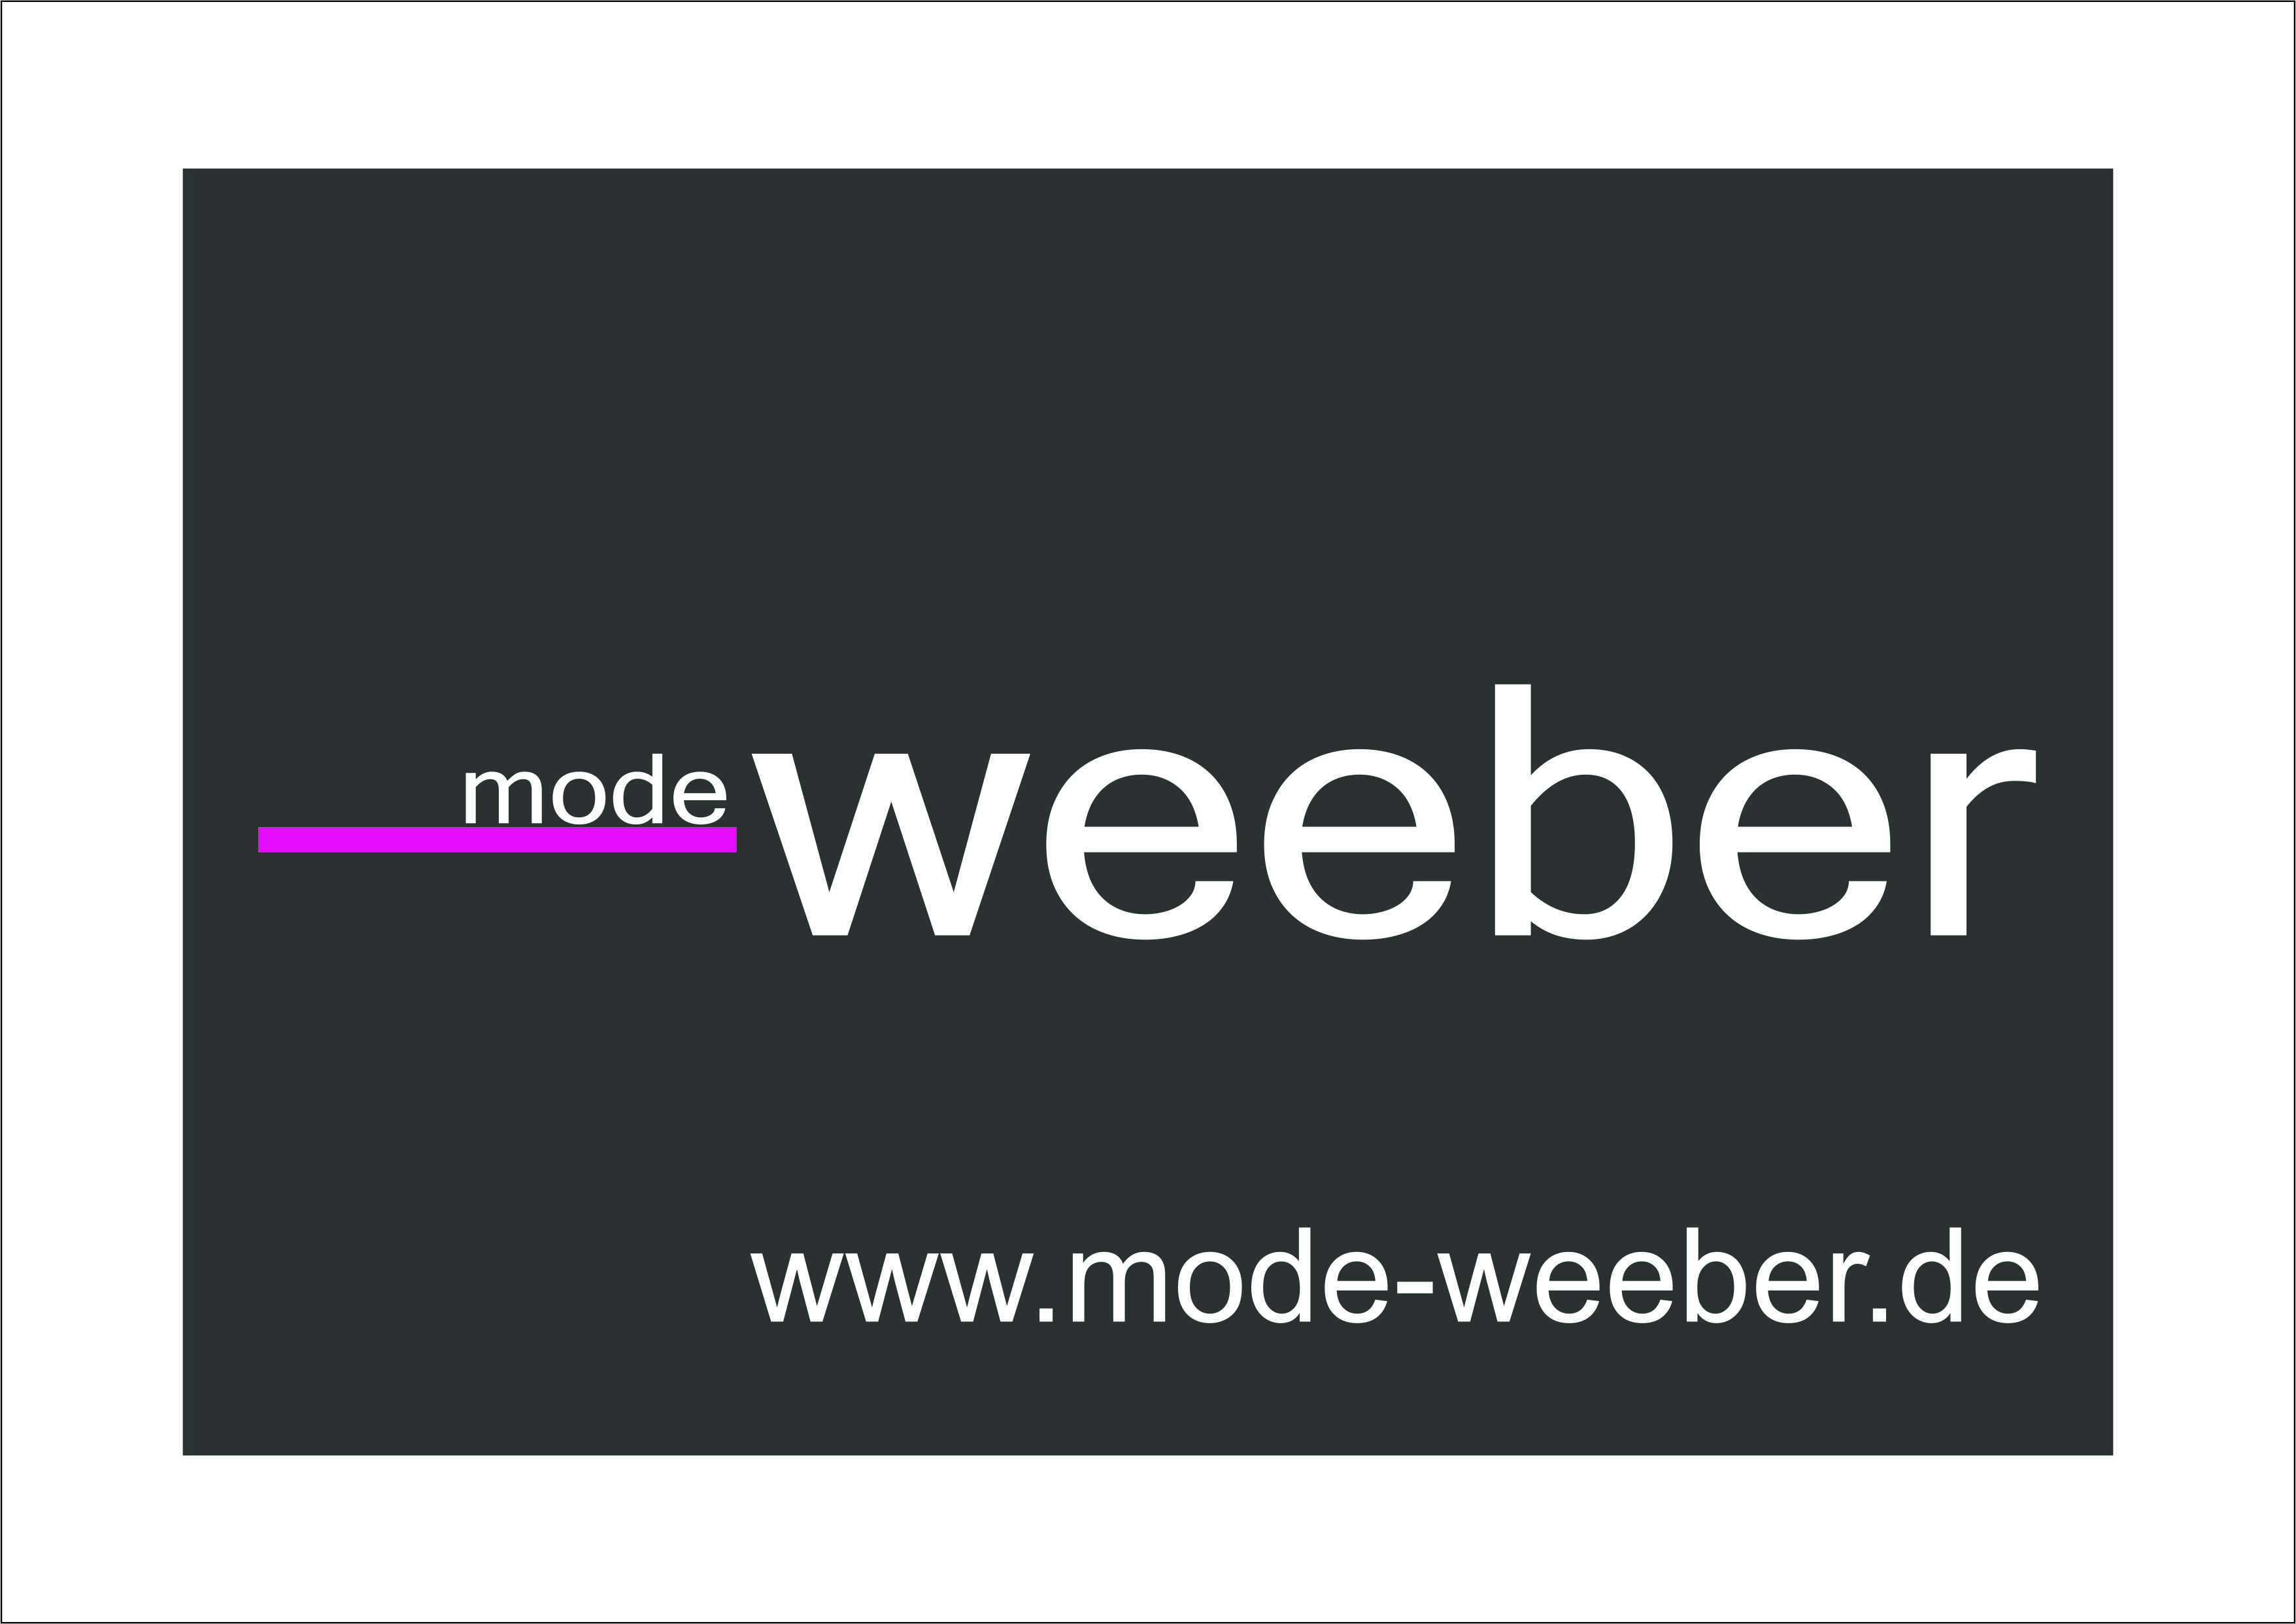 Mode Weeber